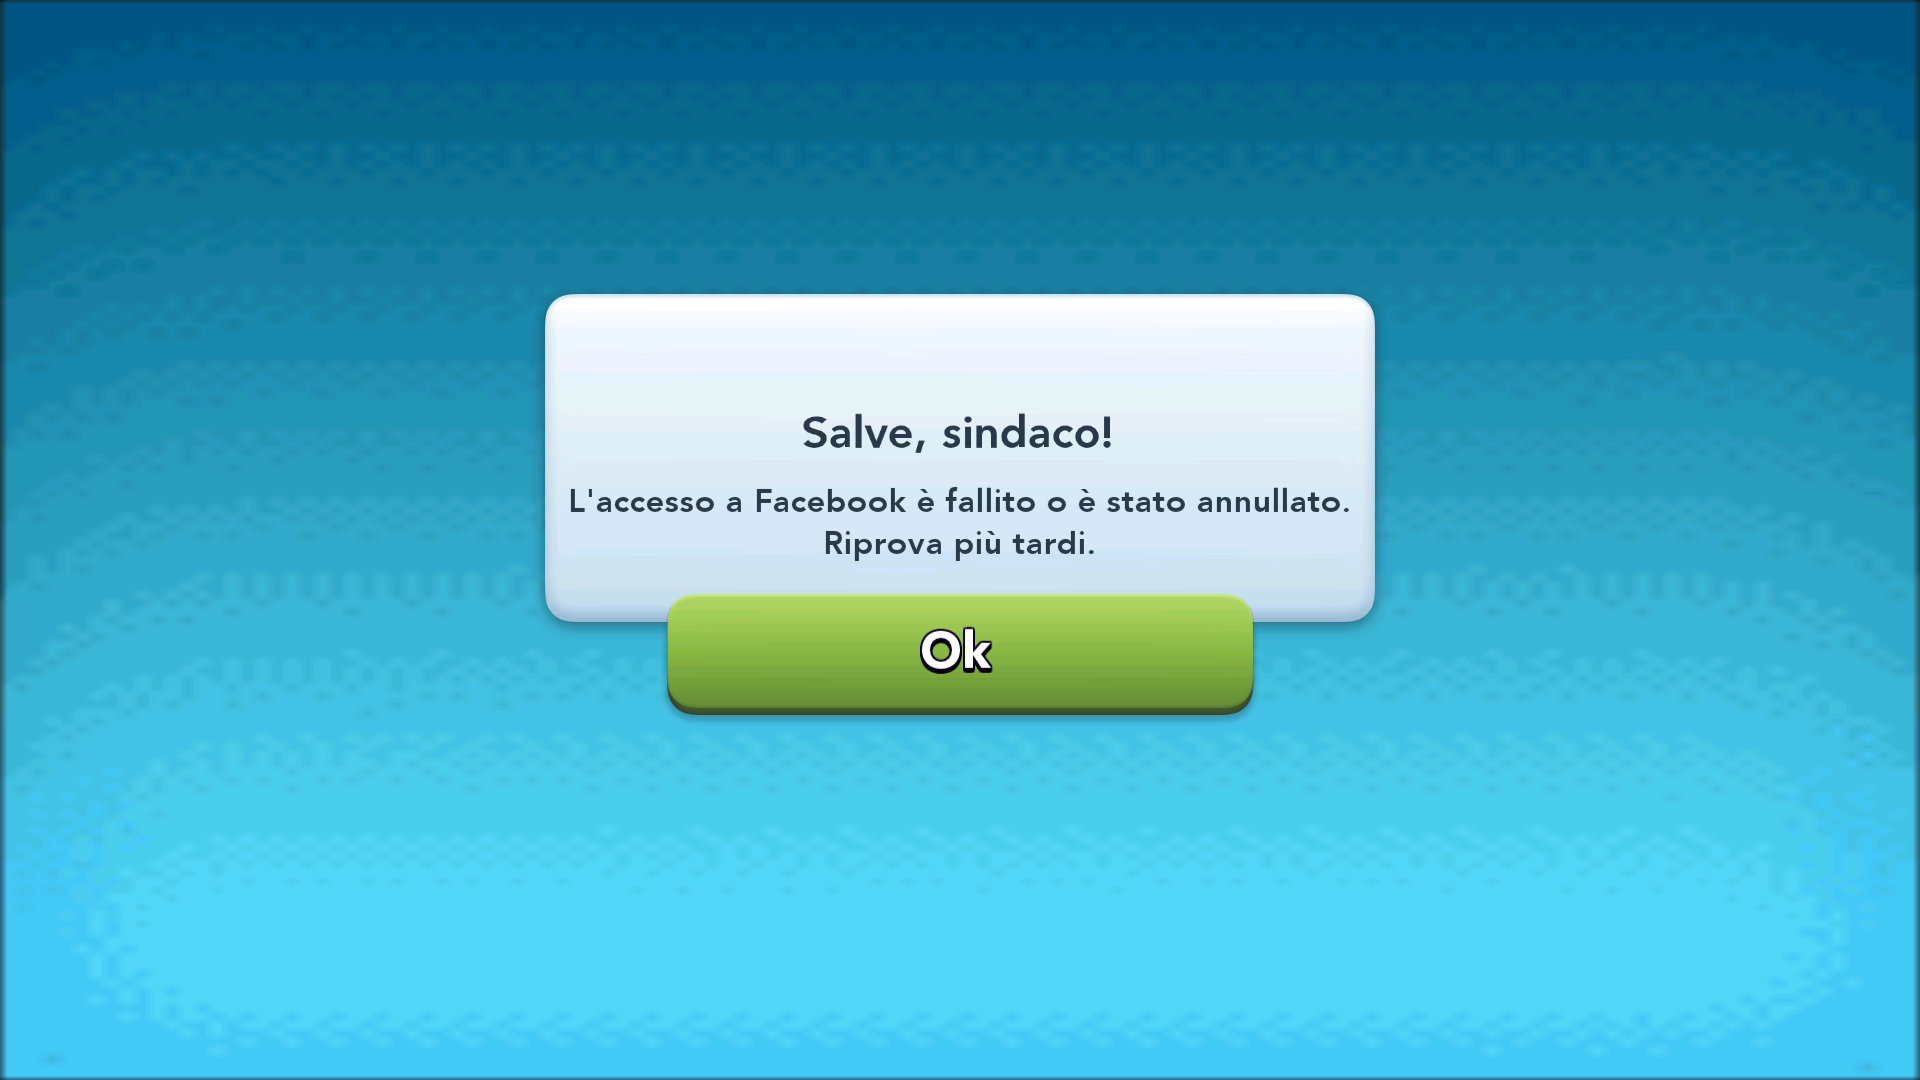 Simcity buildit facebook access problem - Answer HQ